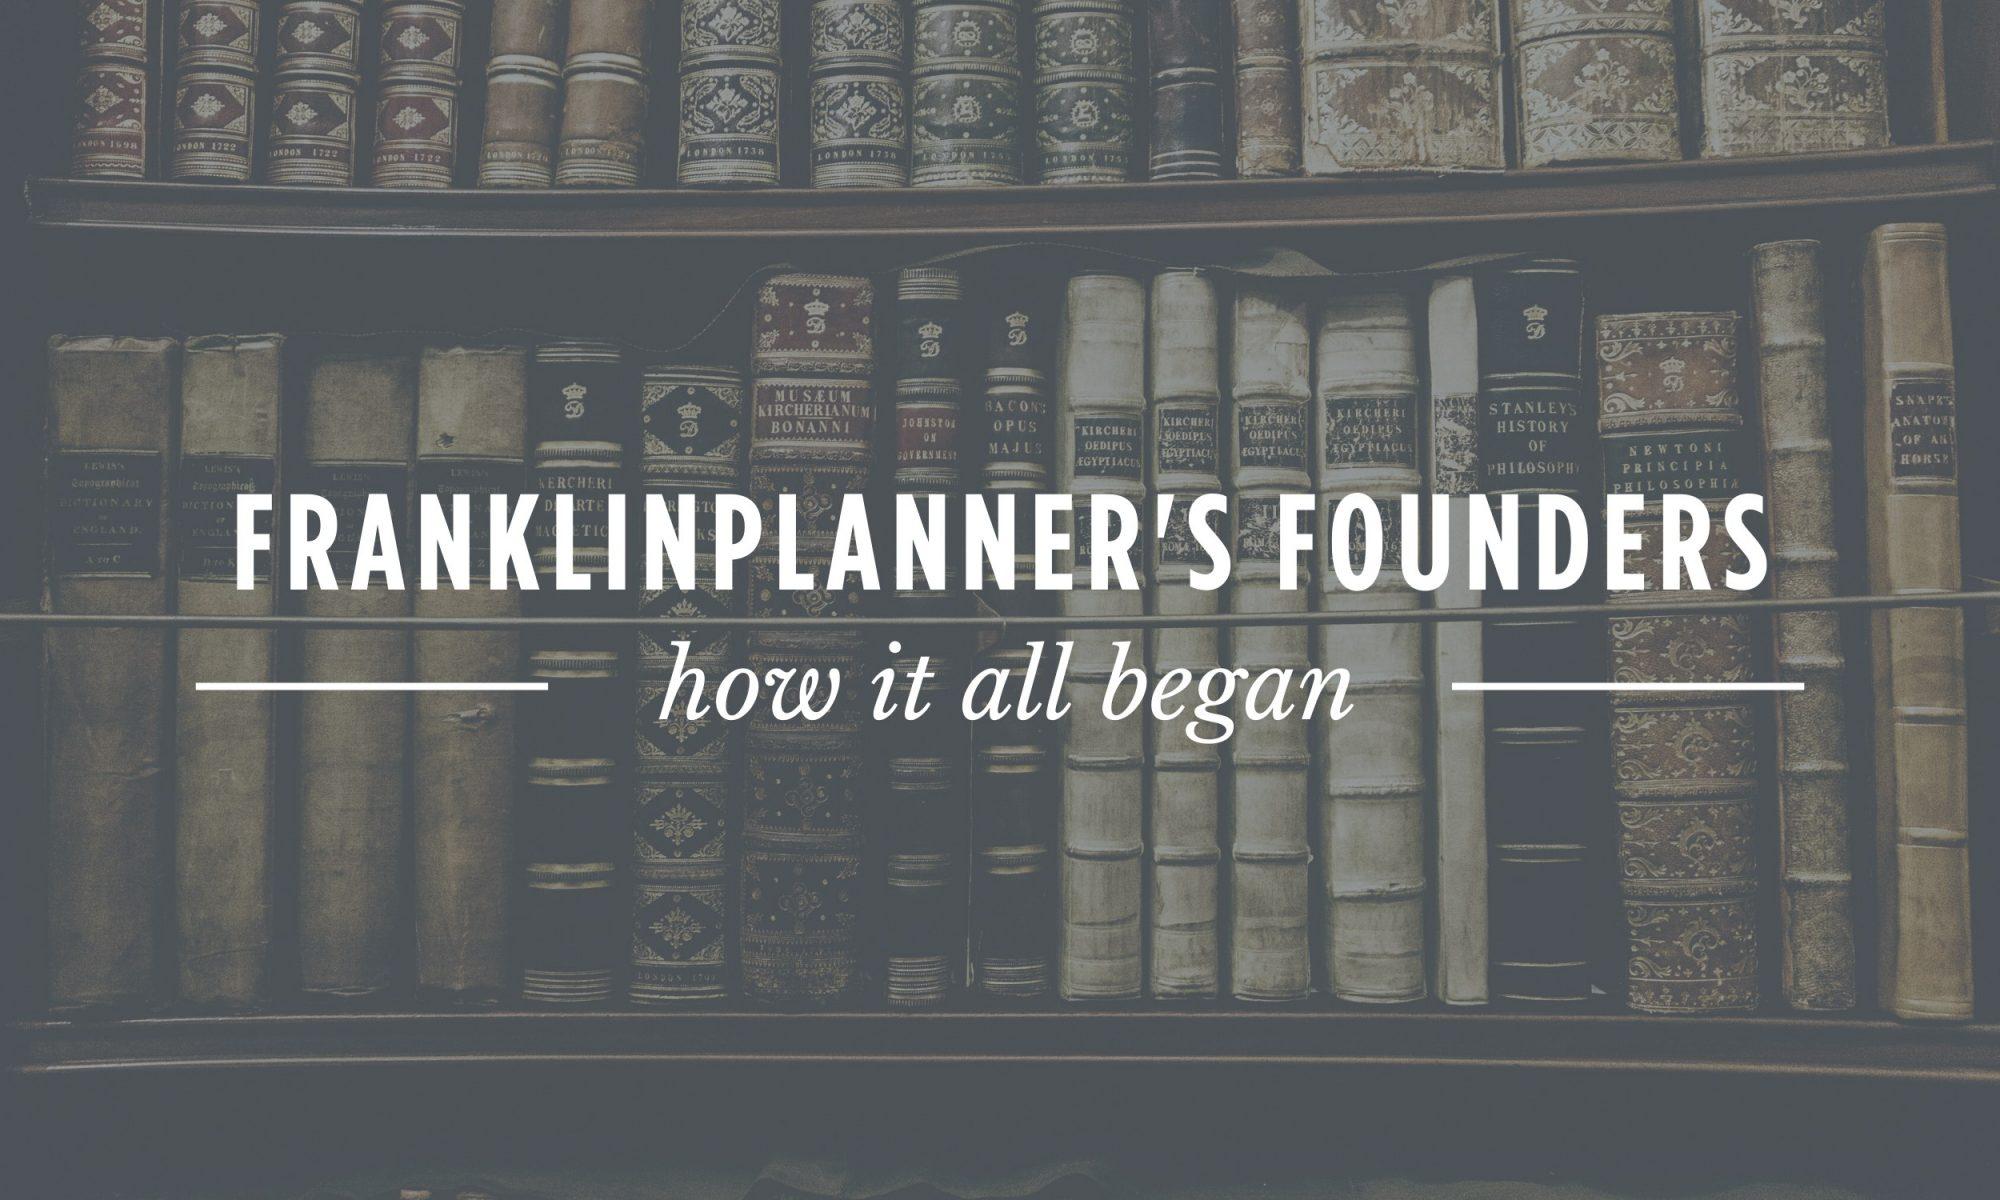 Franklinplanner's Founders. How it all began